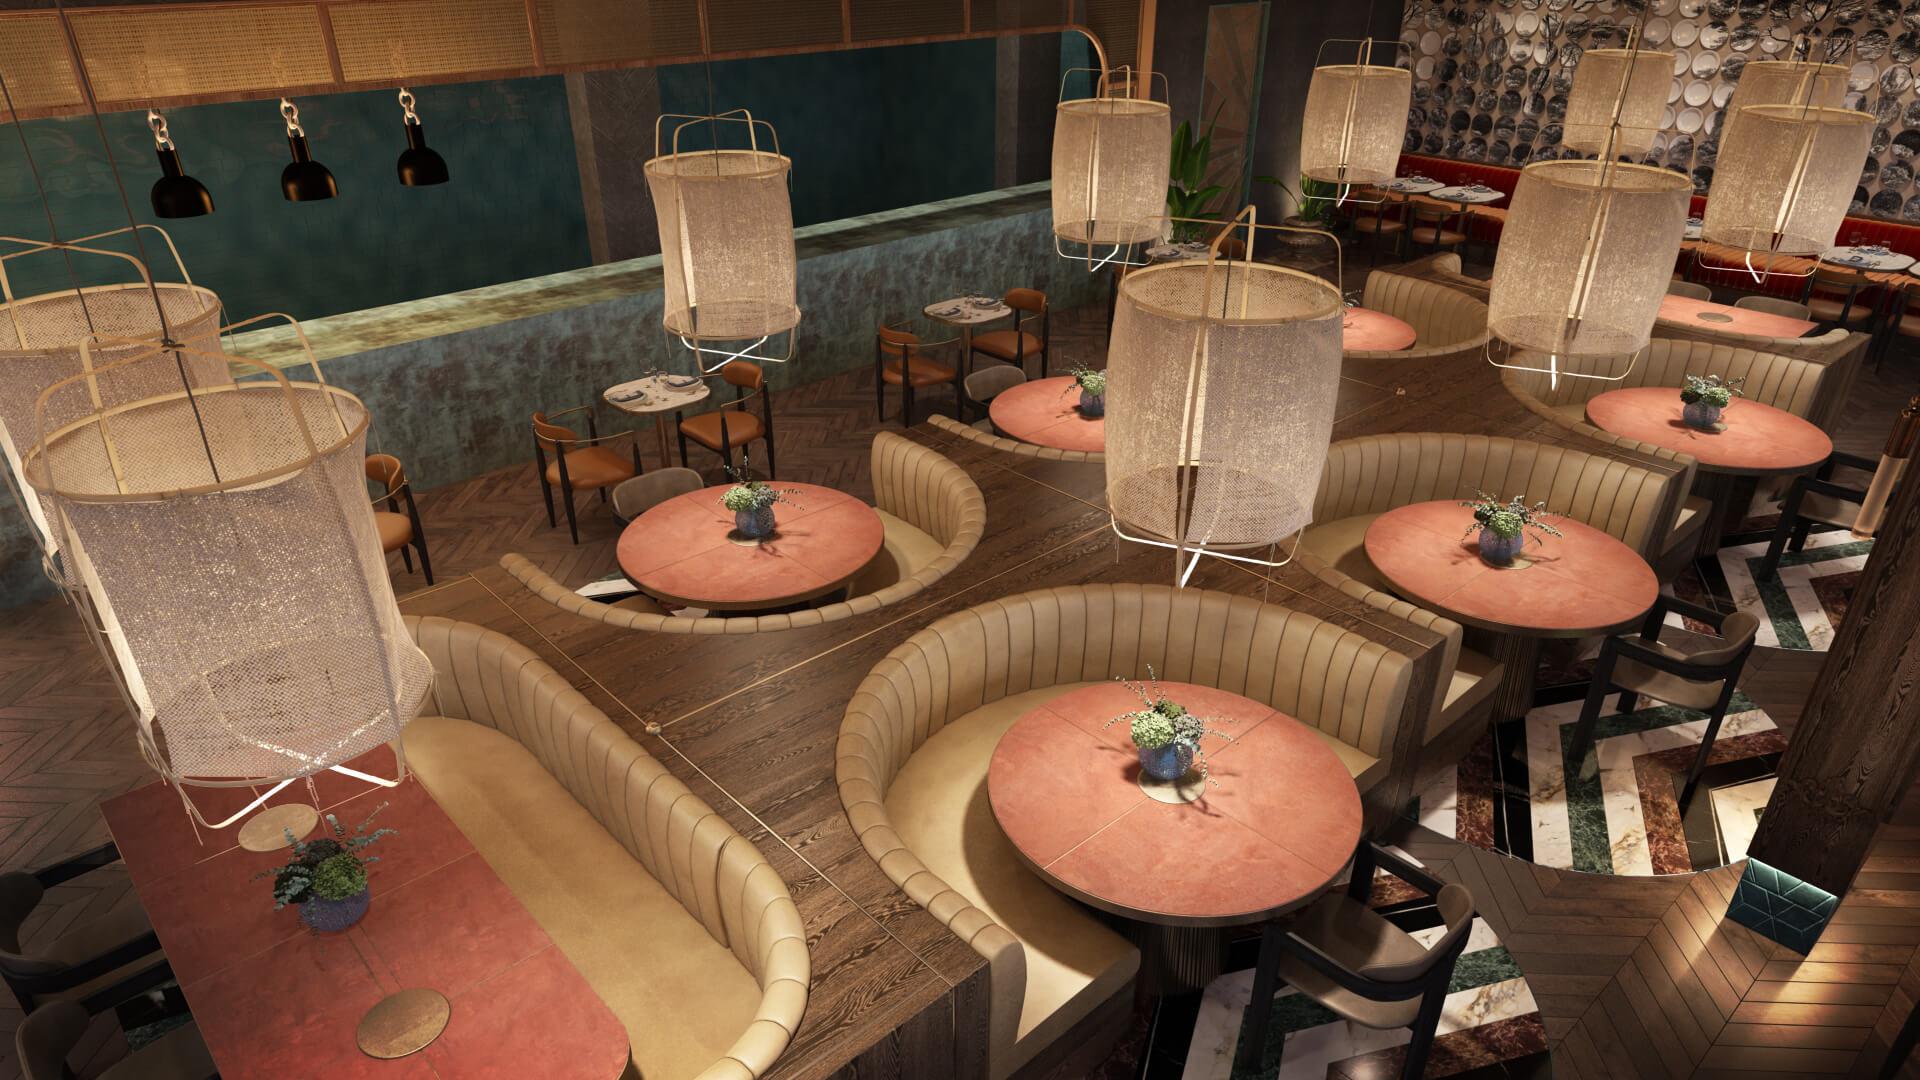 3D Rendering for a Restaurant Design